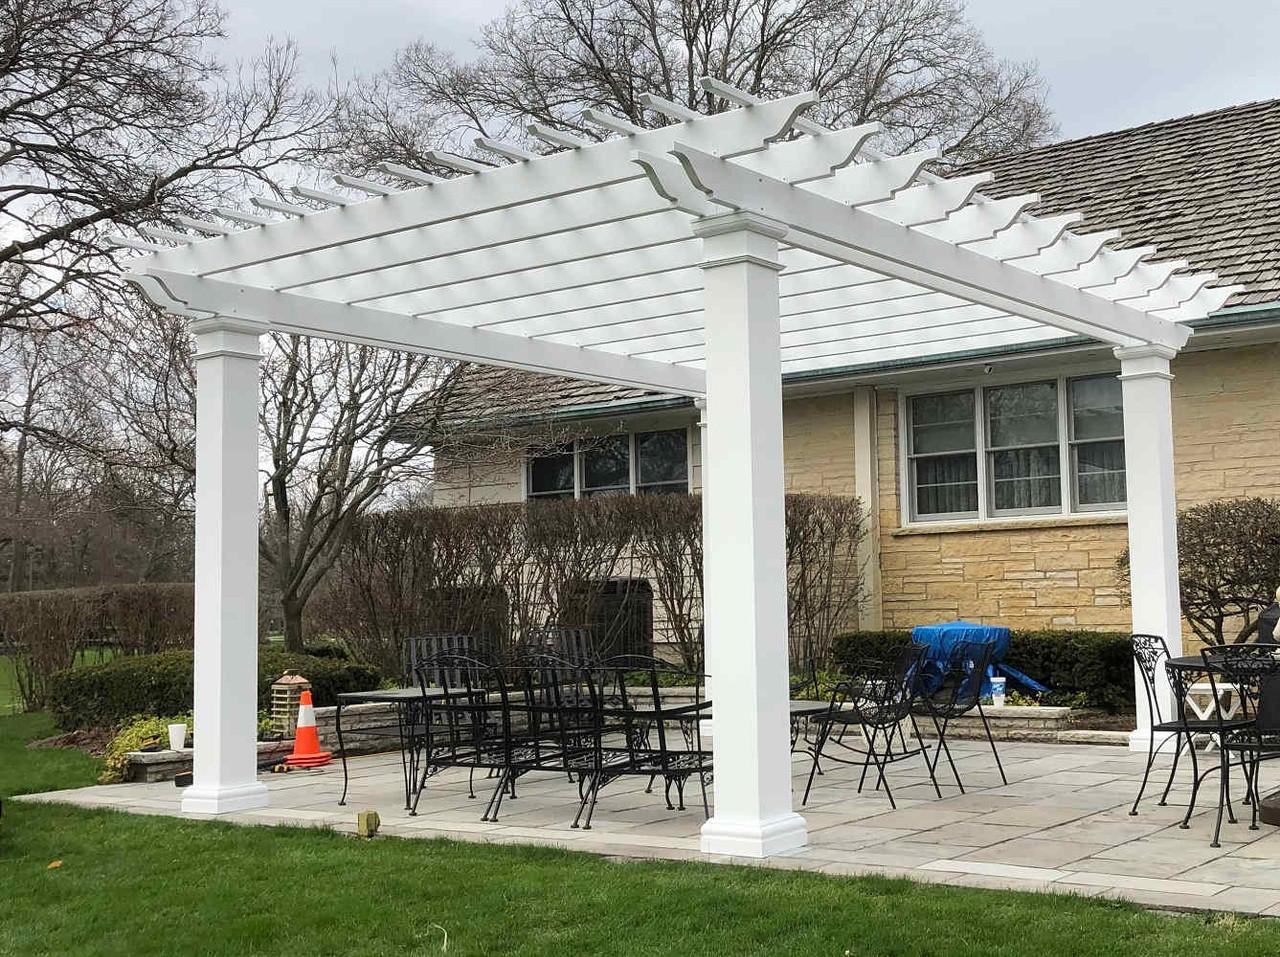 19x16 Freestanding Structural Fiberglass Pergola Kit, Kankakee, Illinois